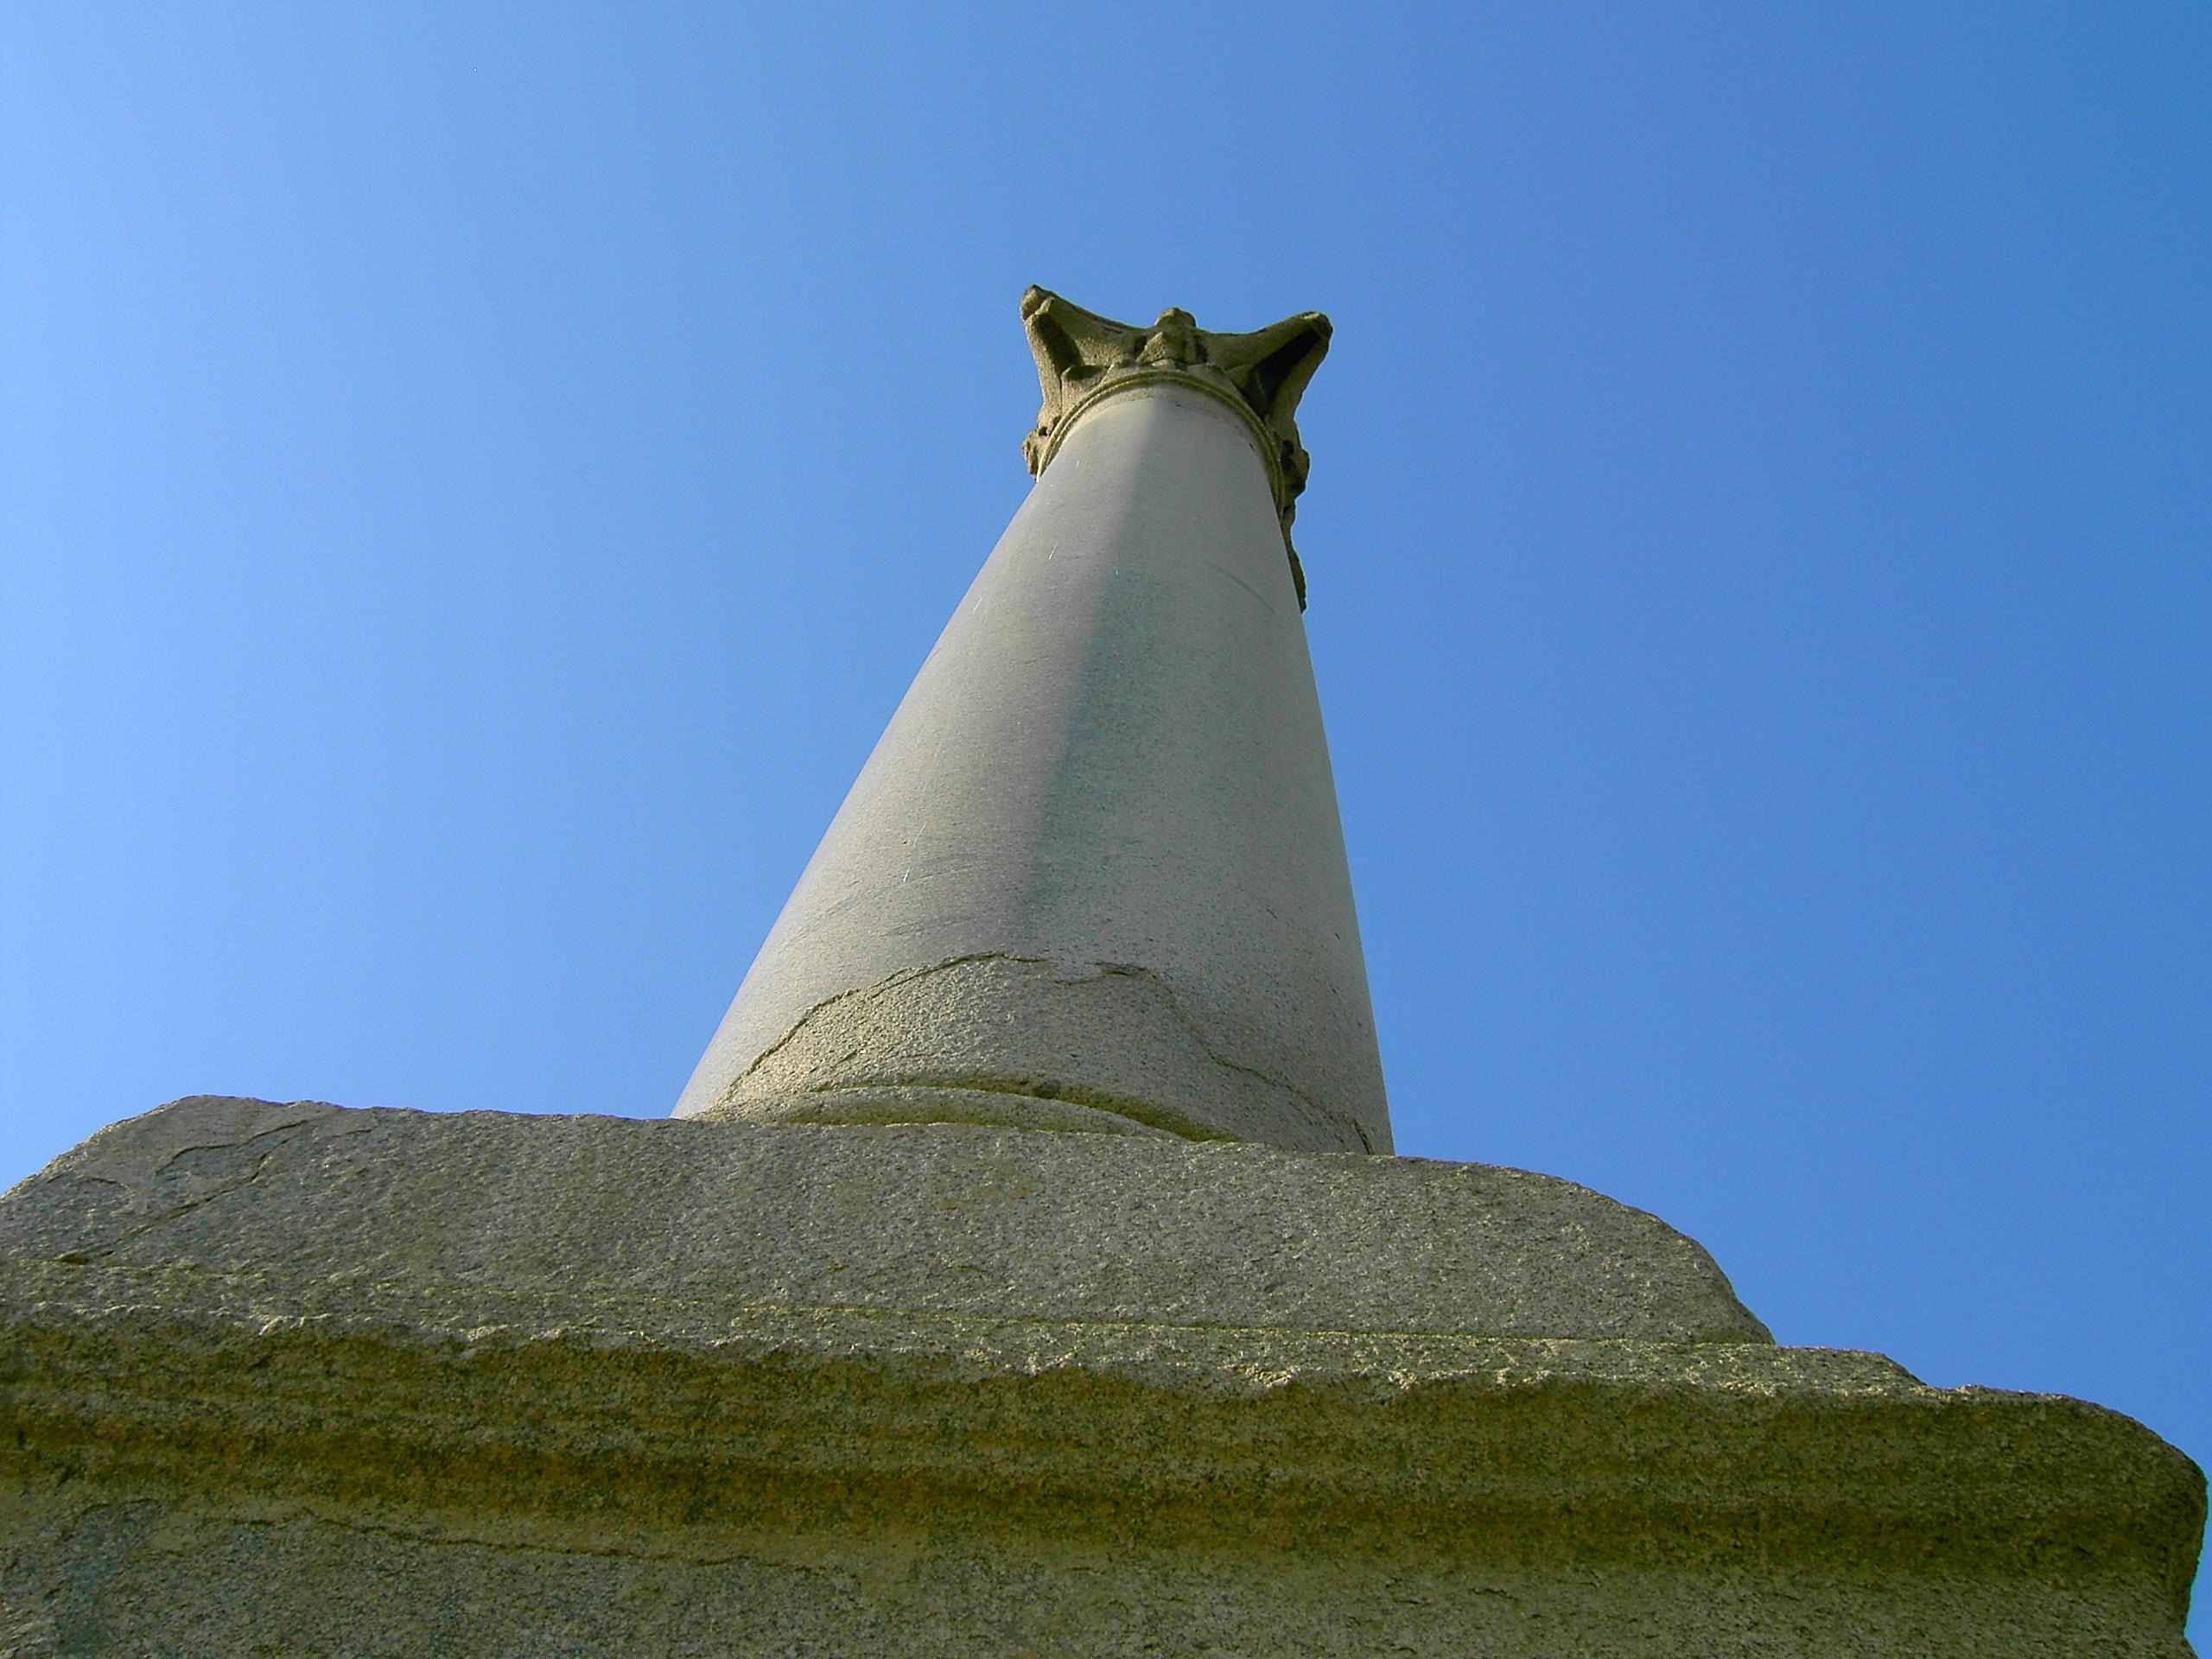 monolithic column wikipedia monolithic column wikipedia